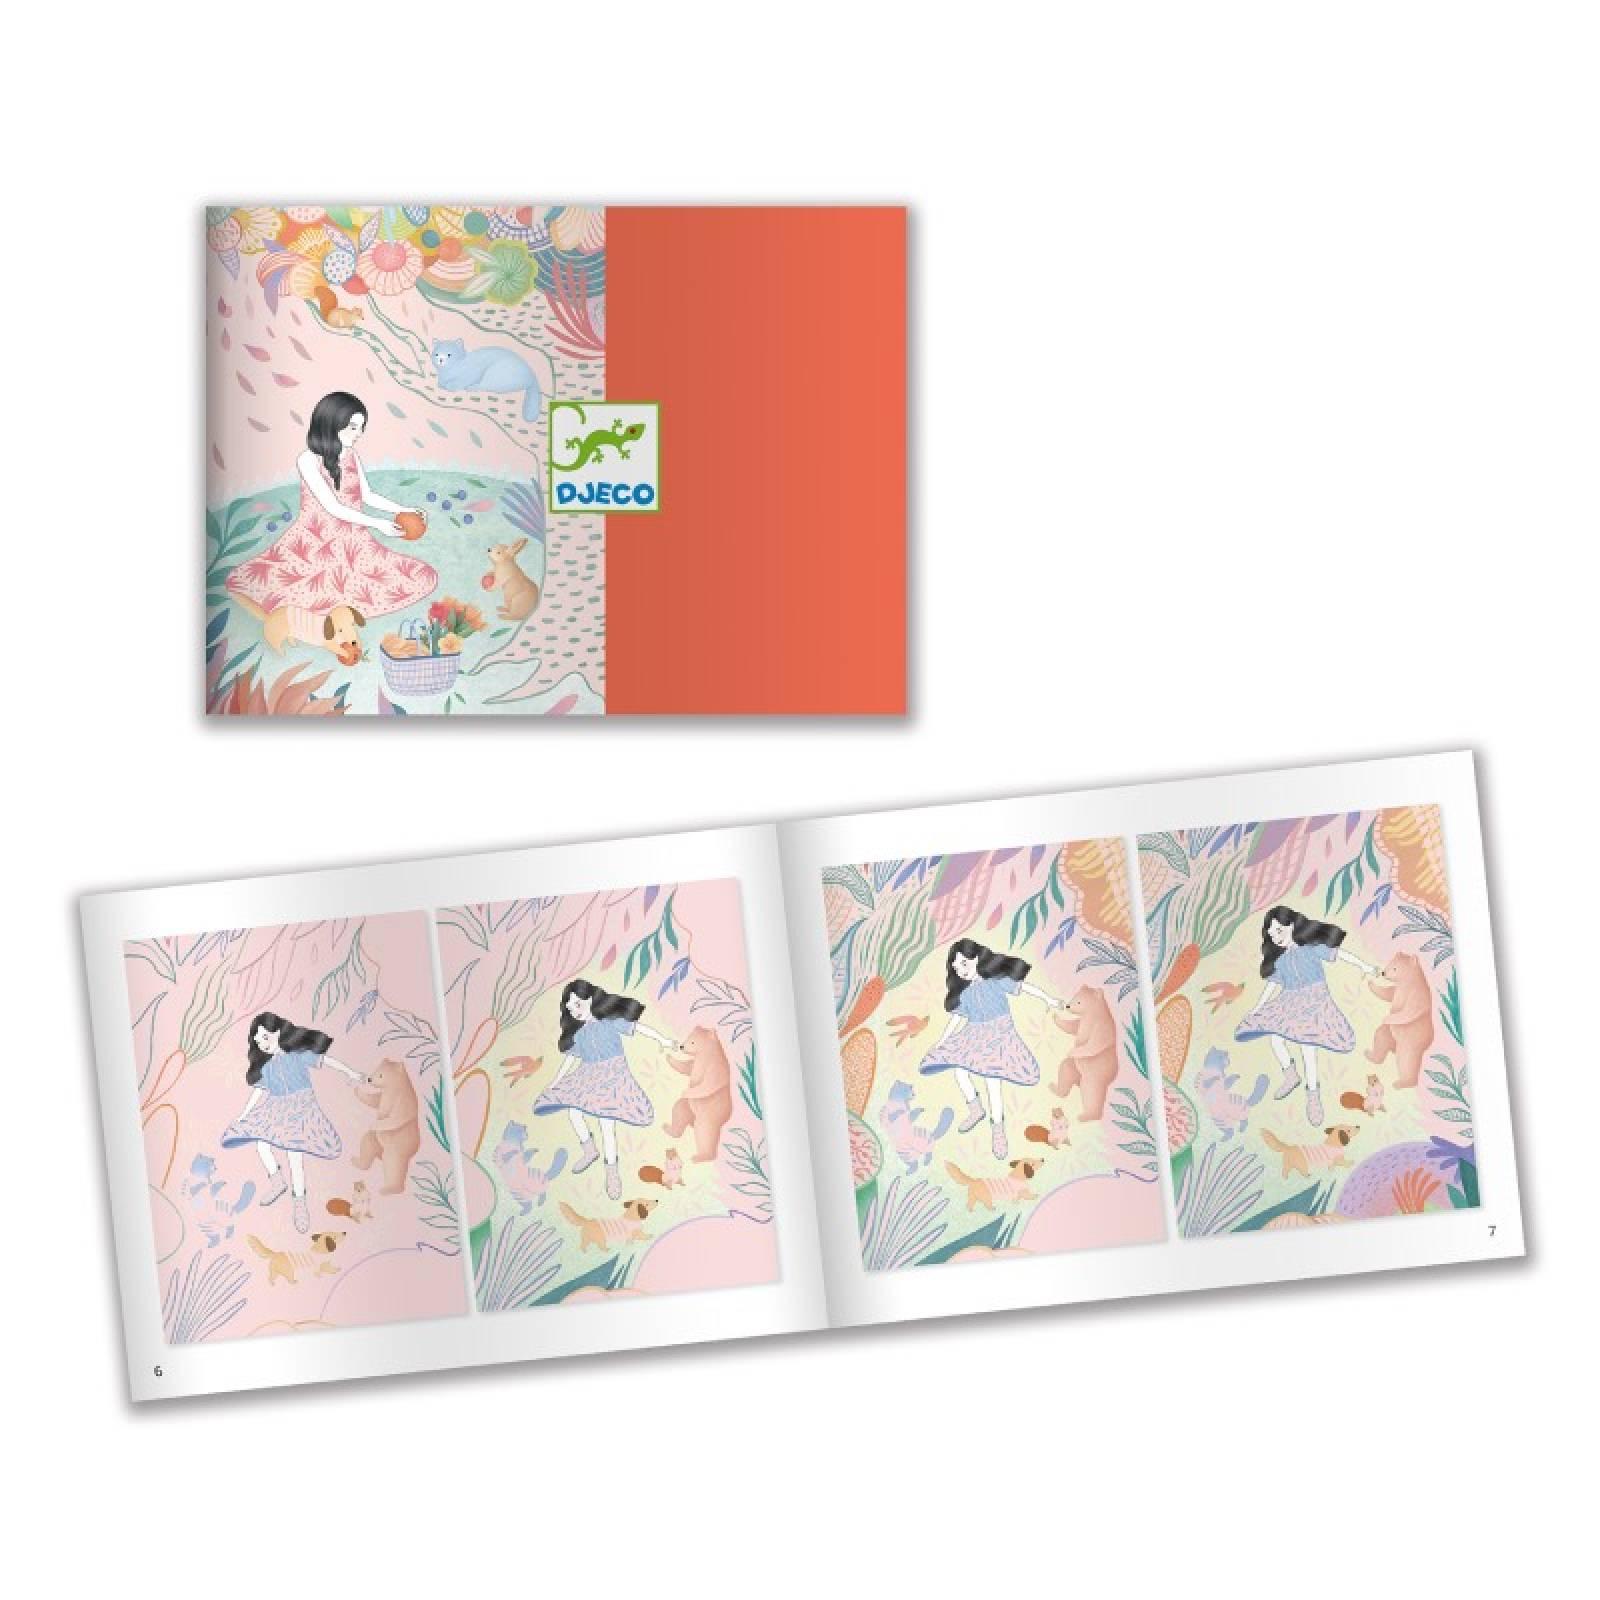 The Picnic - Scratch Art Cards 7+ thumbnails